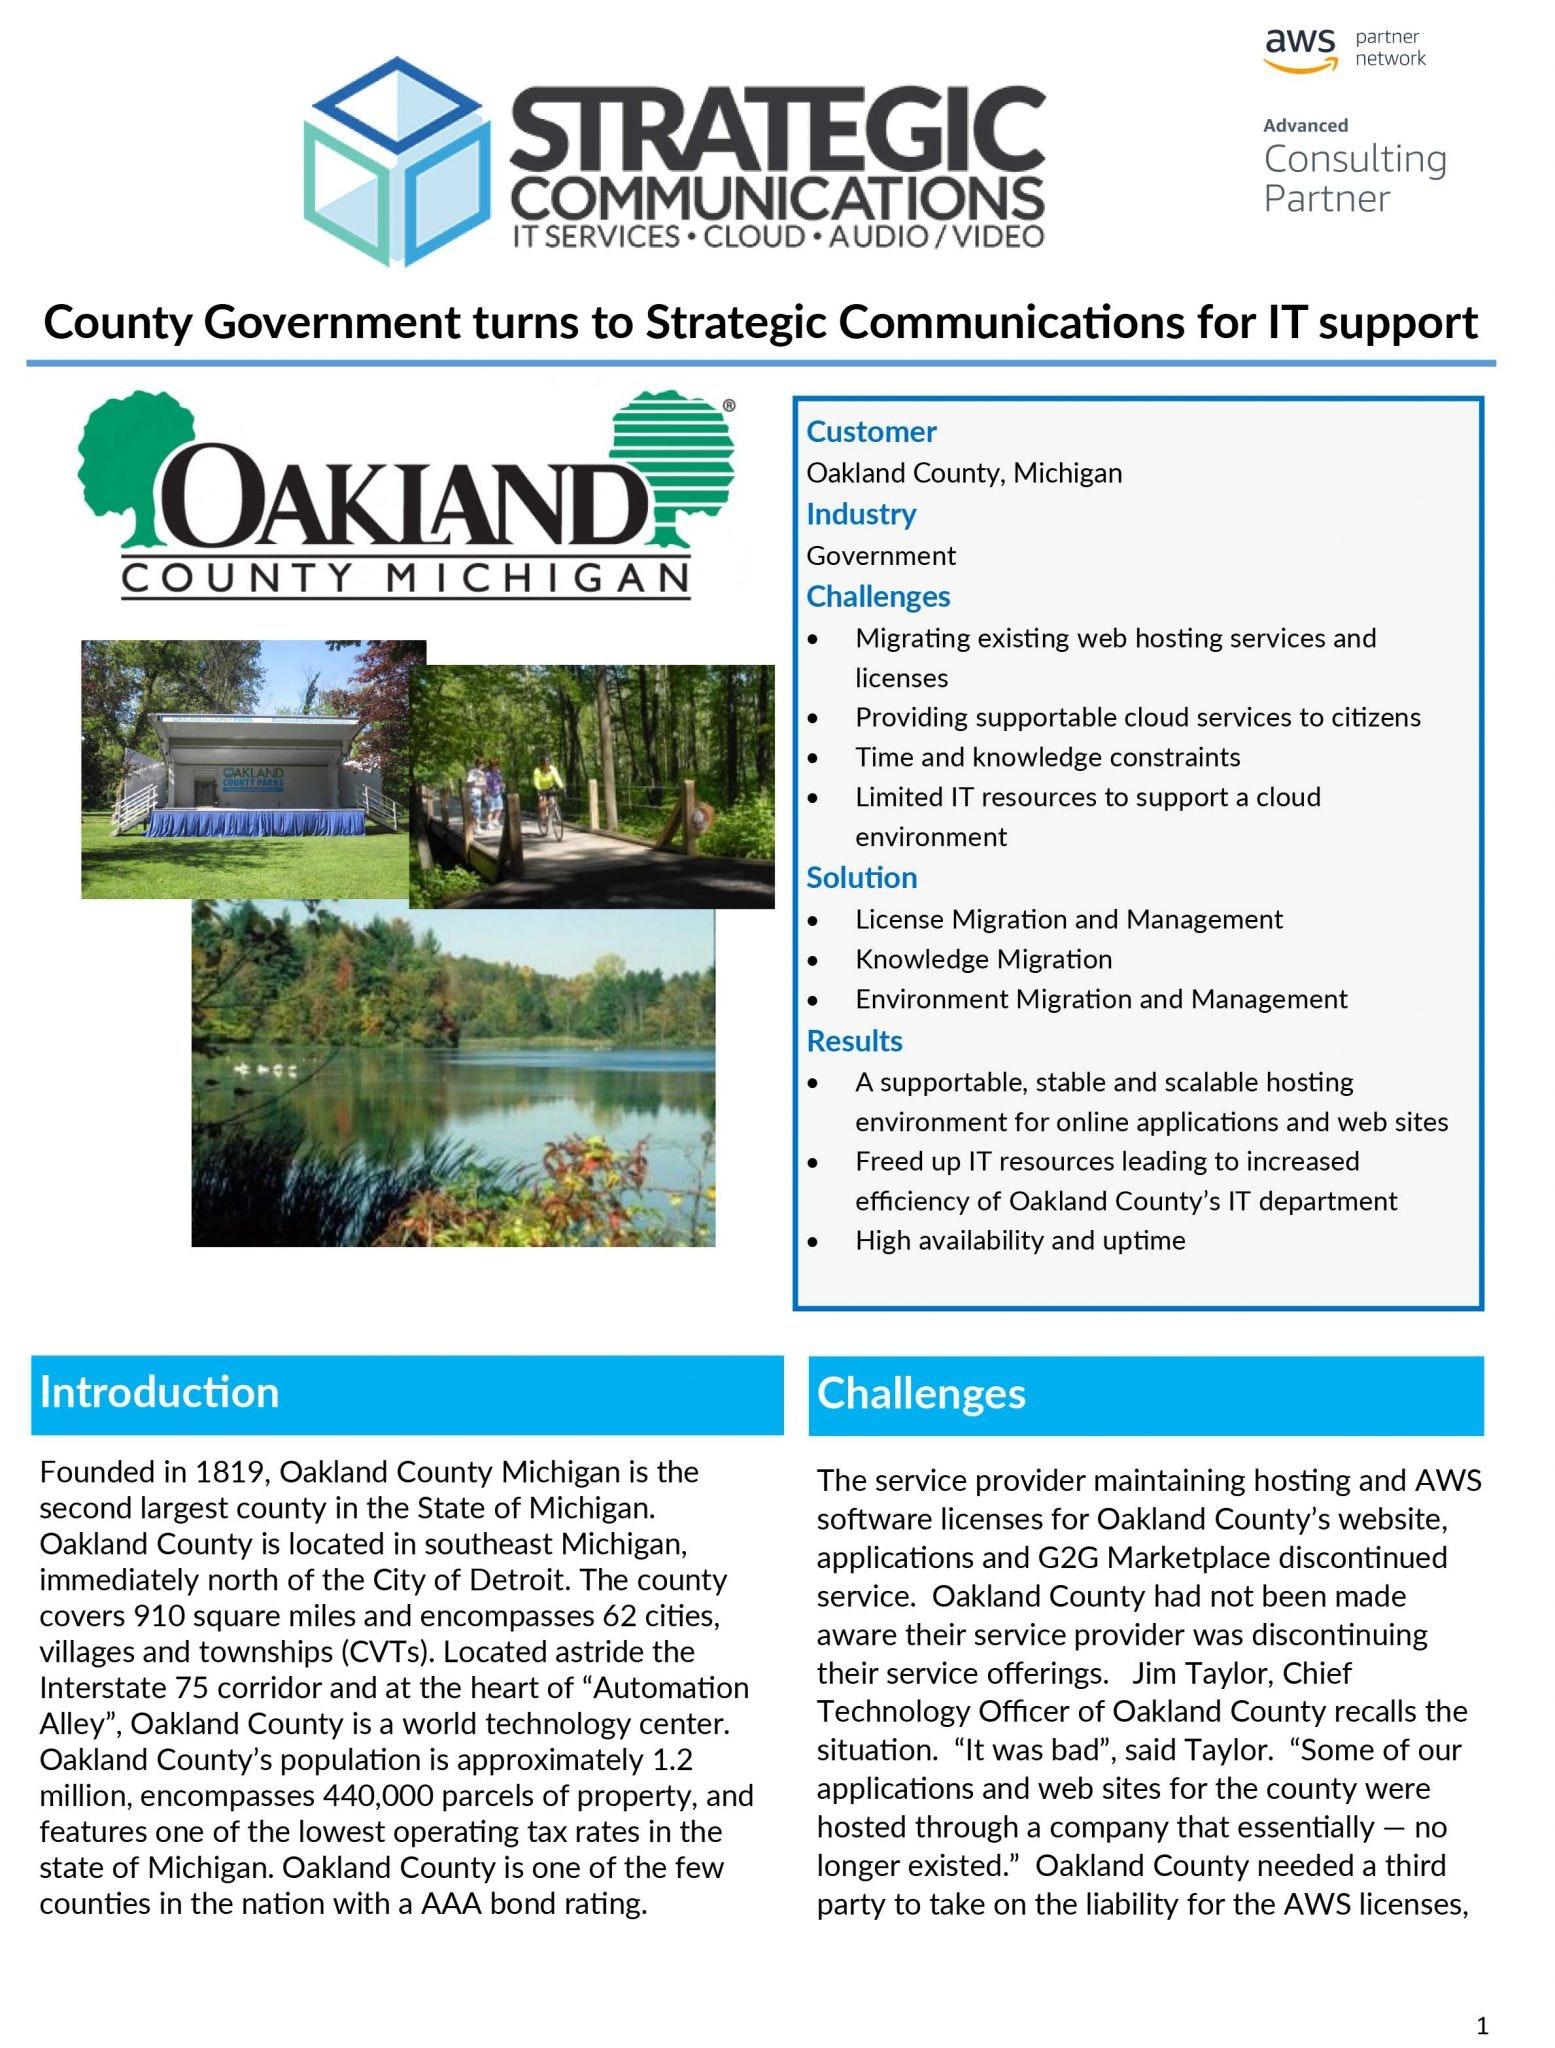 Oakland County Case Study